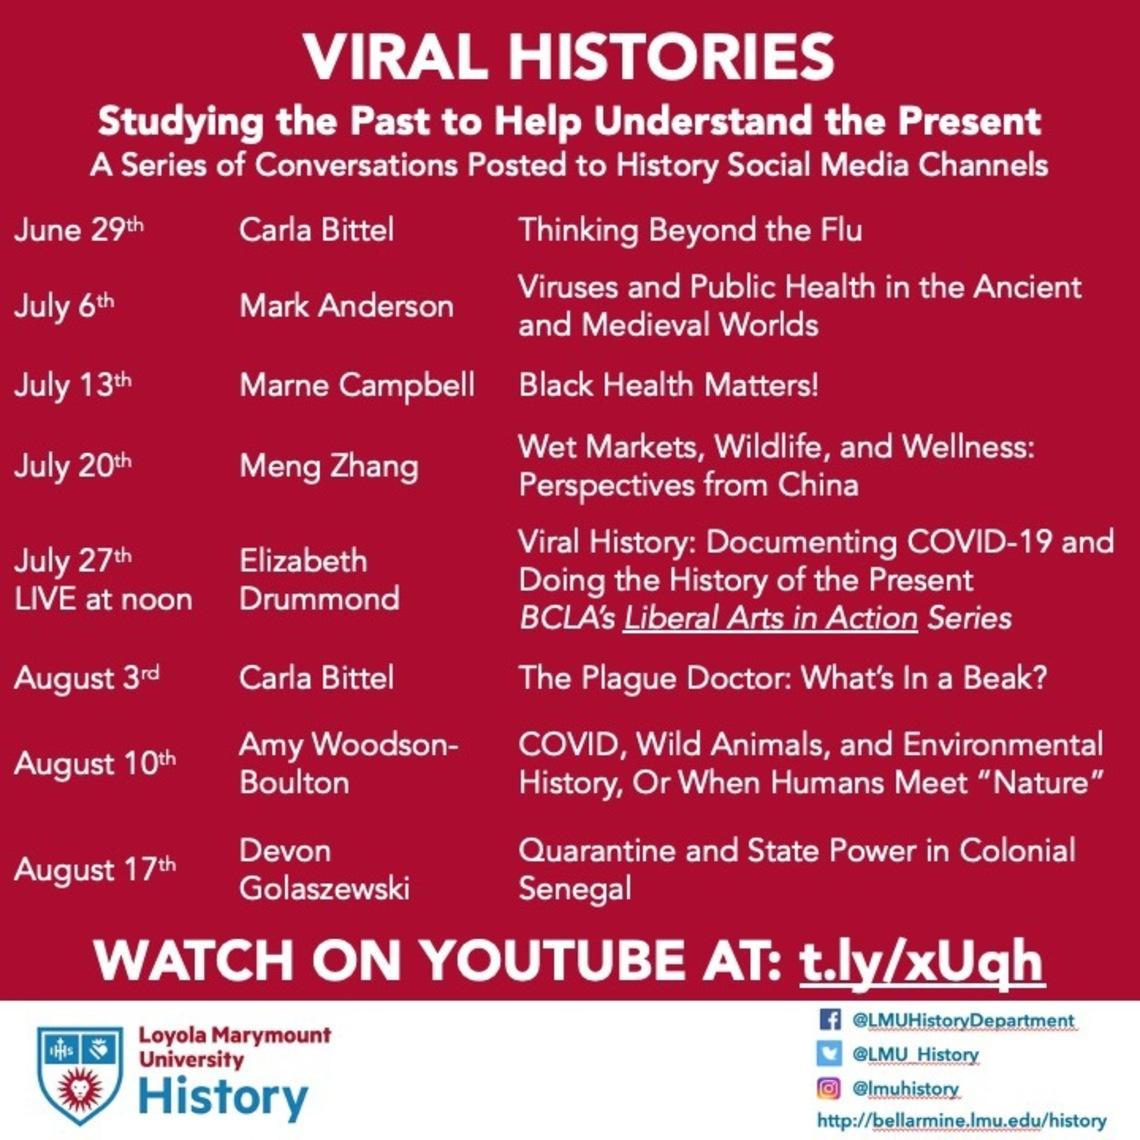 Viral Histories